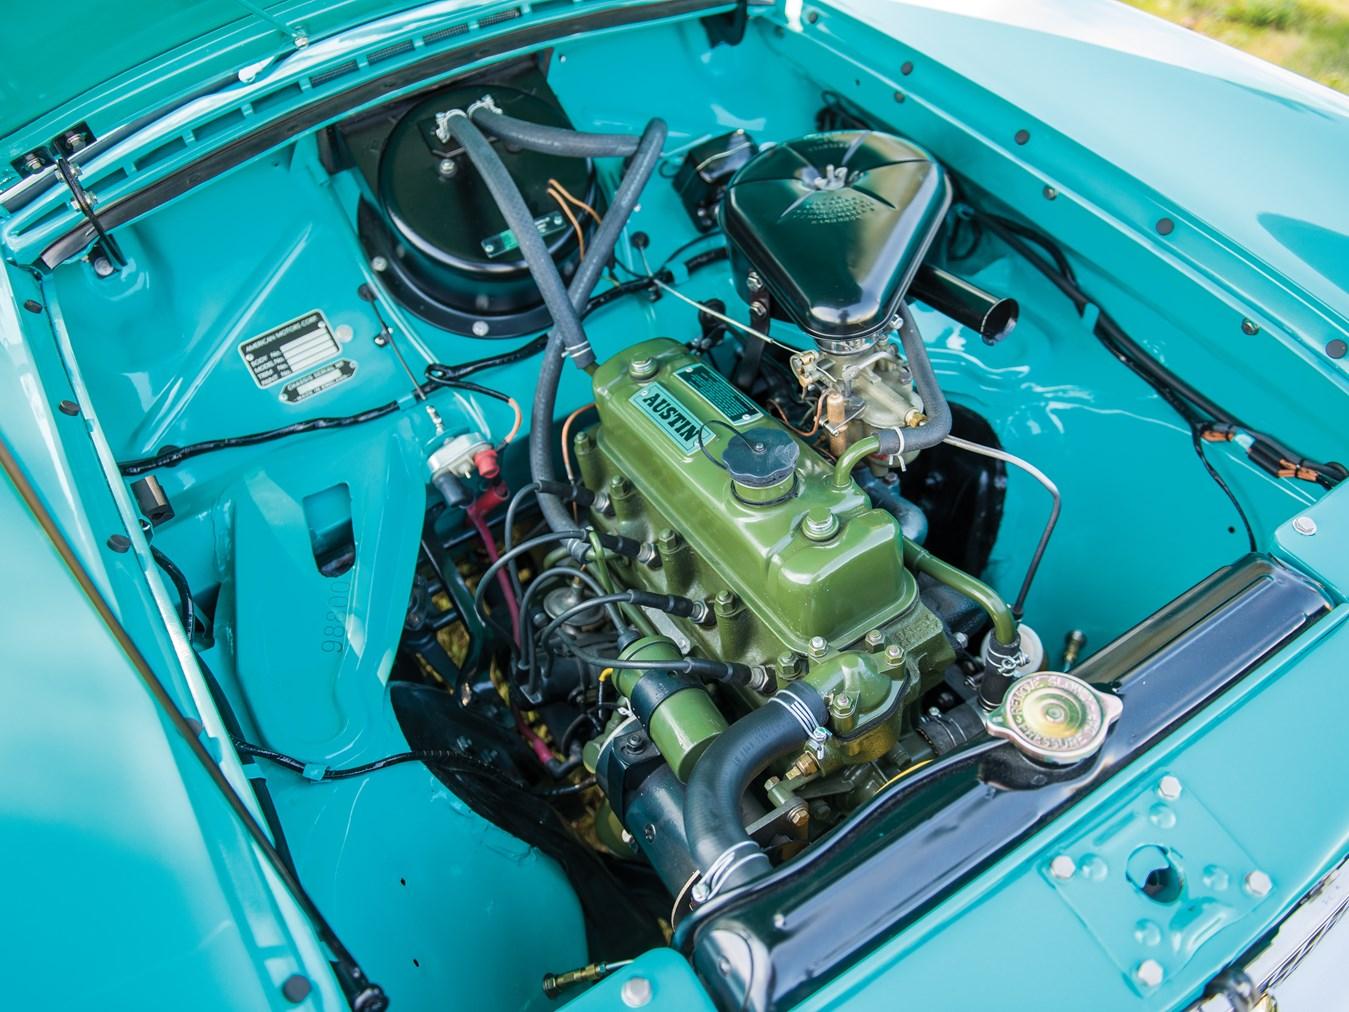 1961 AMC Metropolitan 1500 Convertible engine